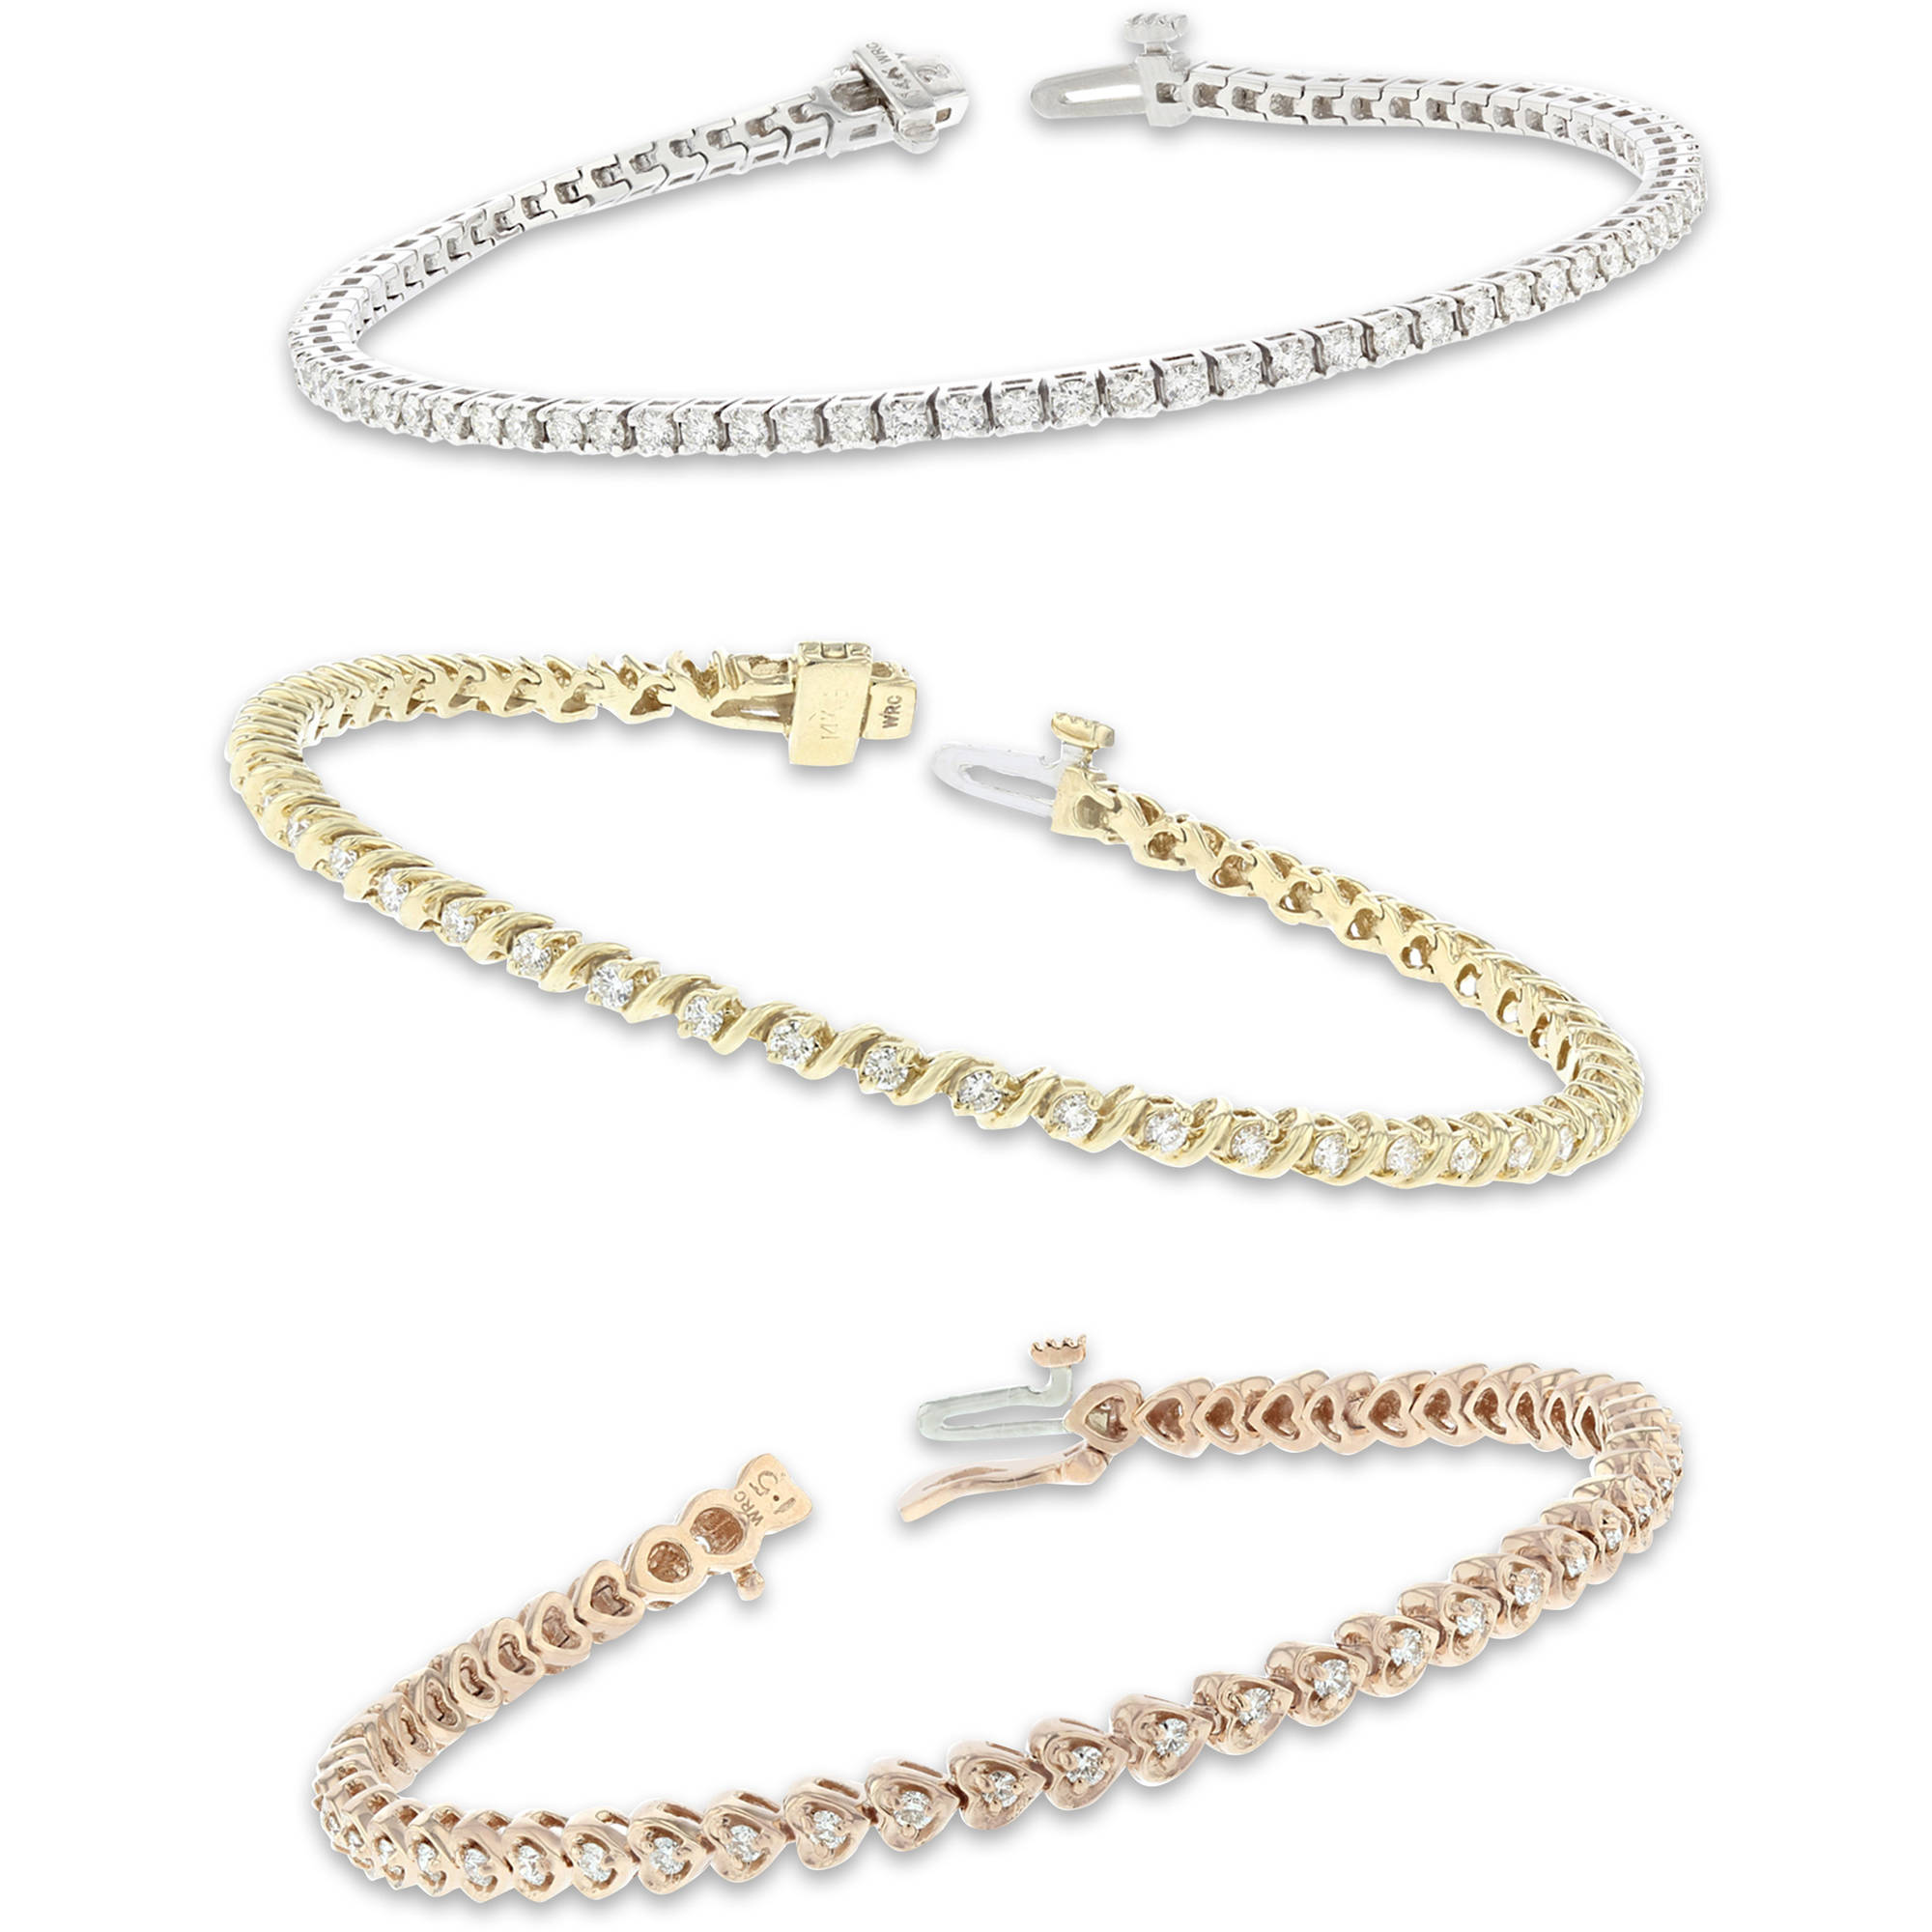 Design Your Own Diamond Tennis Bracelet by WRCOBB